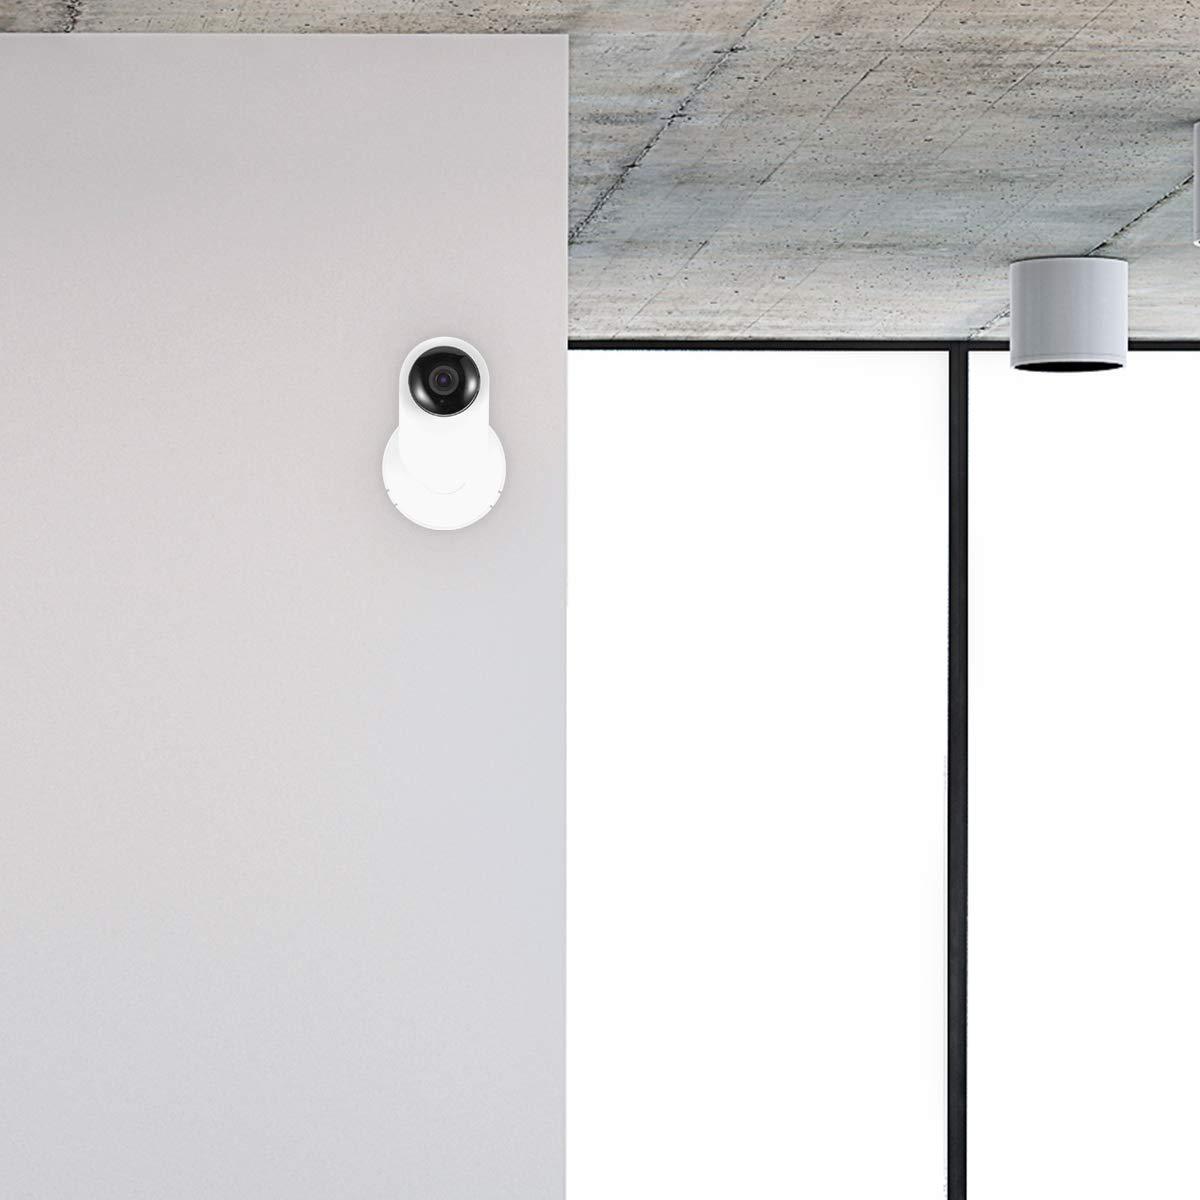 Wall Mount for Yi Home Camera,LANMU Home Camera Wall Mount Stand Bracket for Yi Home Security Camera 360 Degree Swivel,Full Install Kit 3 Pack